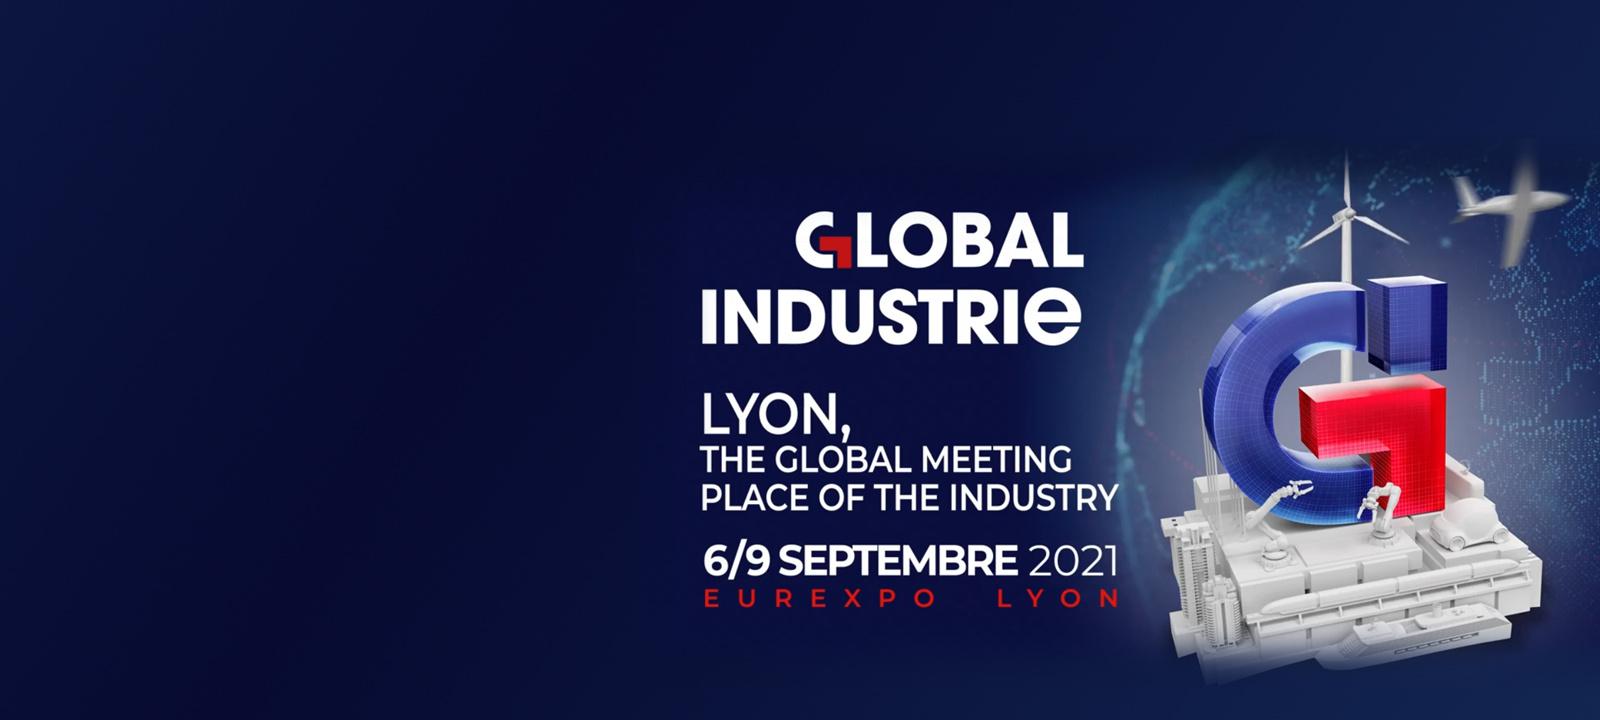 banniere-actu-global-industrie-228